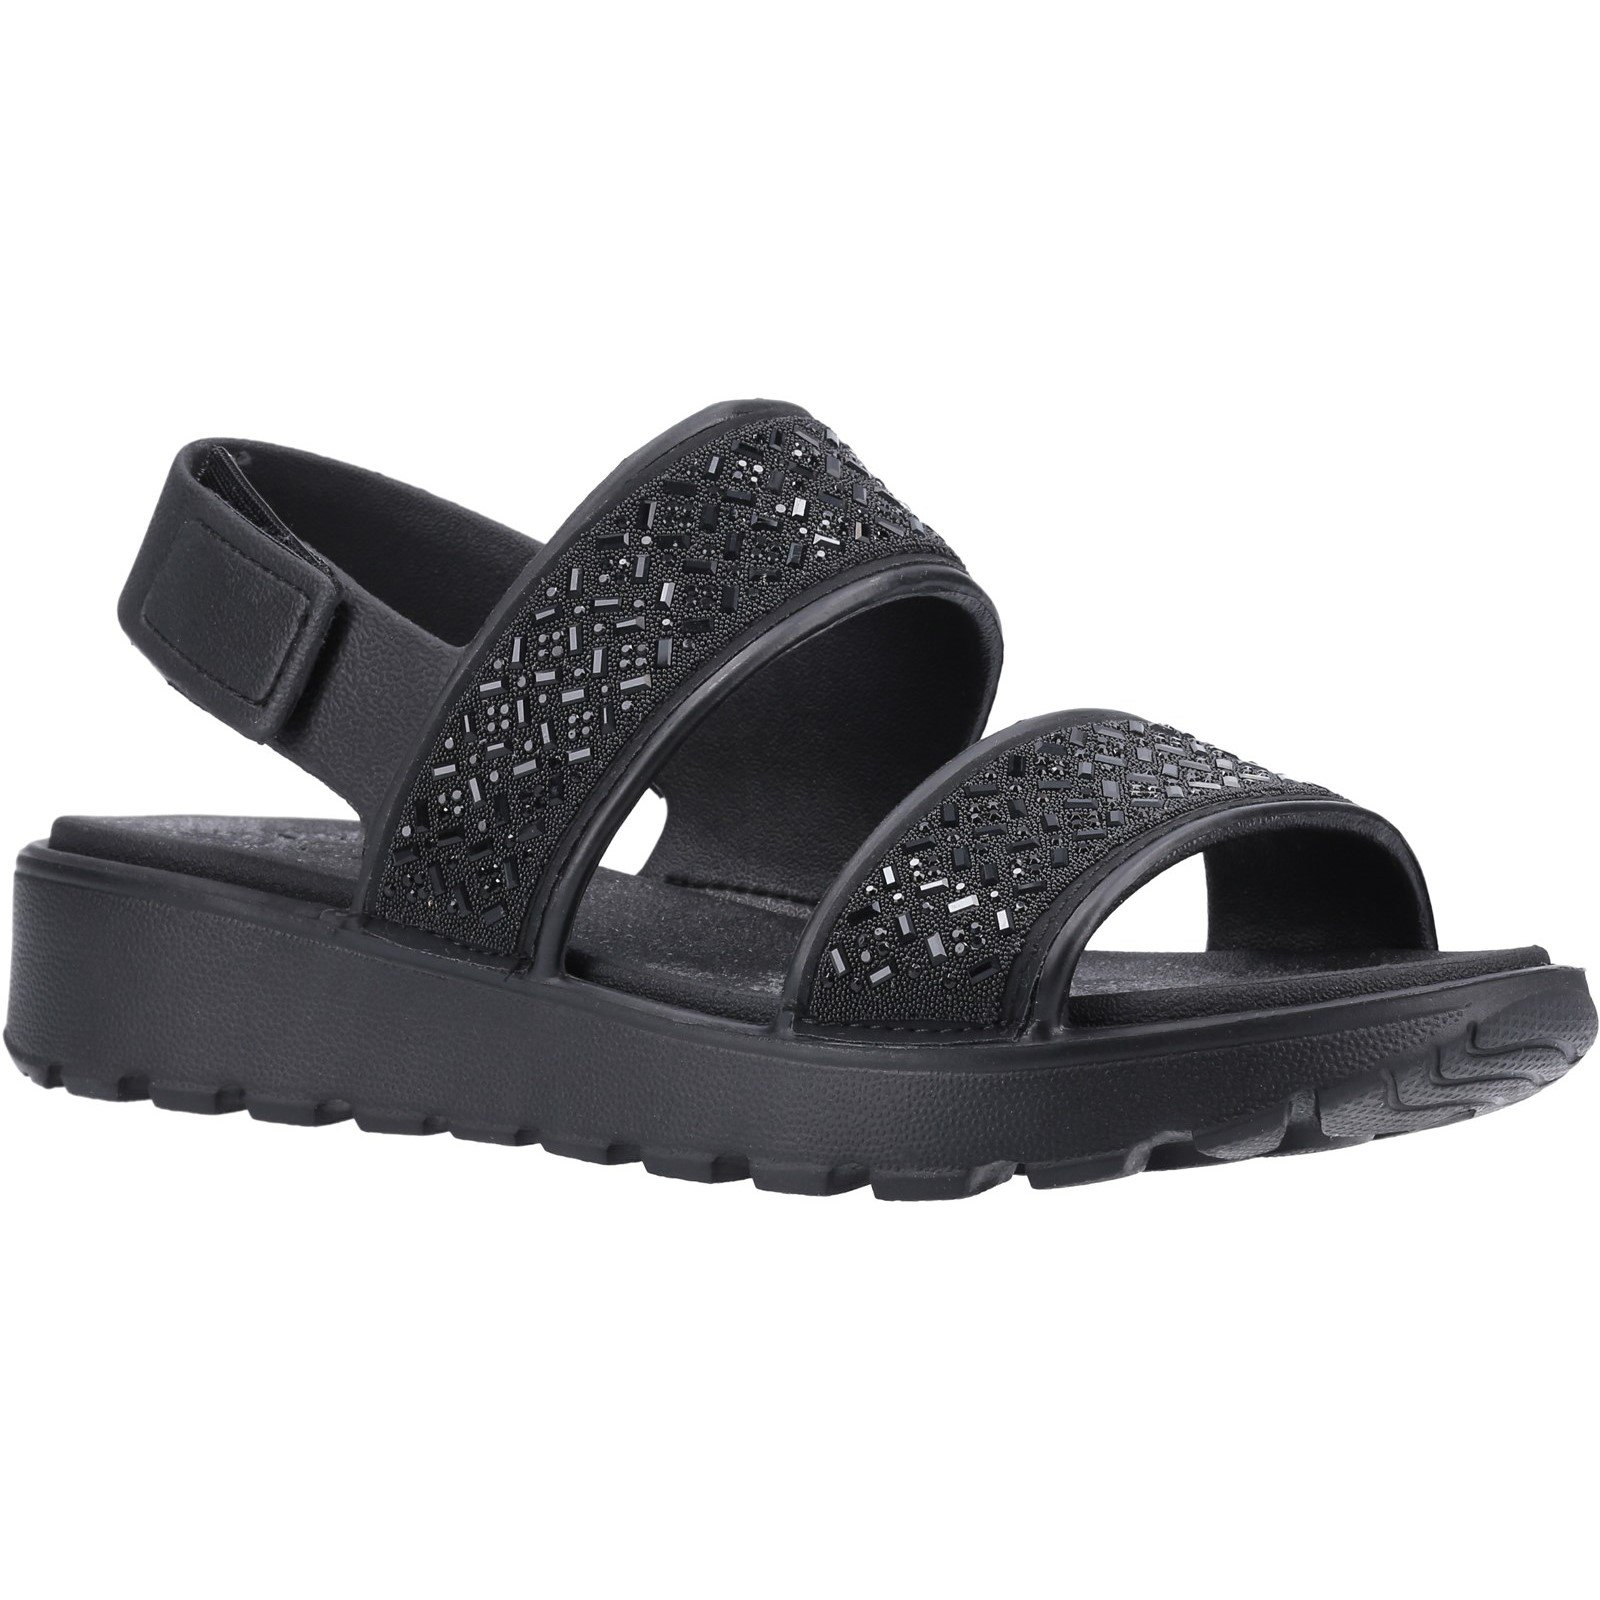 Skechers Women's Footsteps Glam Party Sandal Black 32369 - Black 5